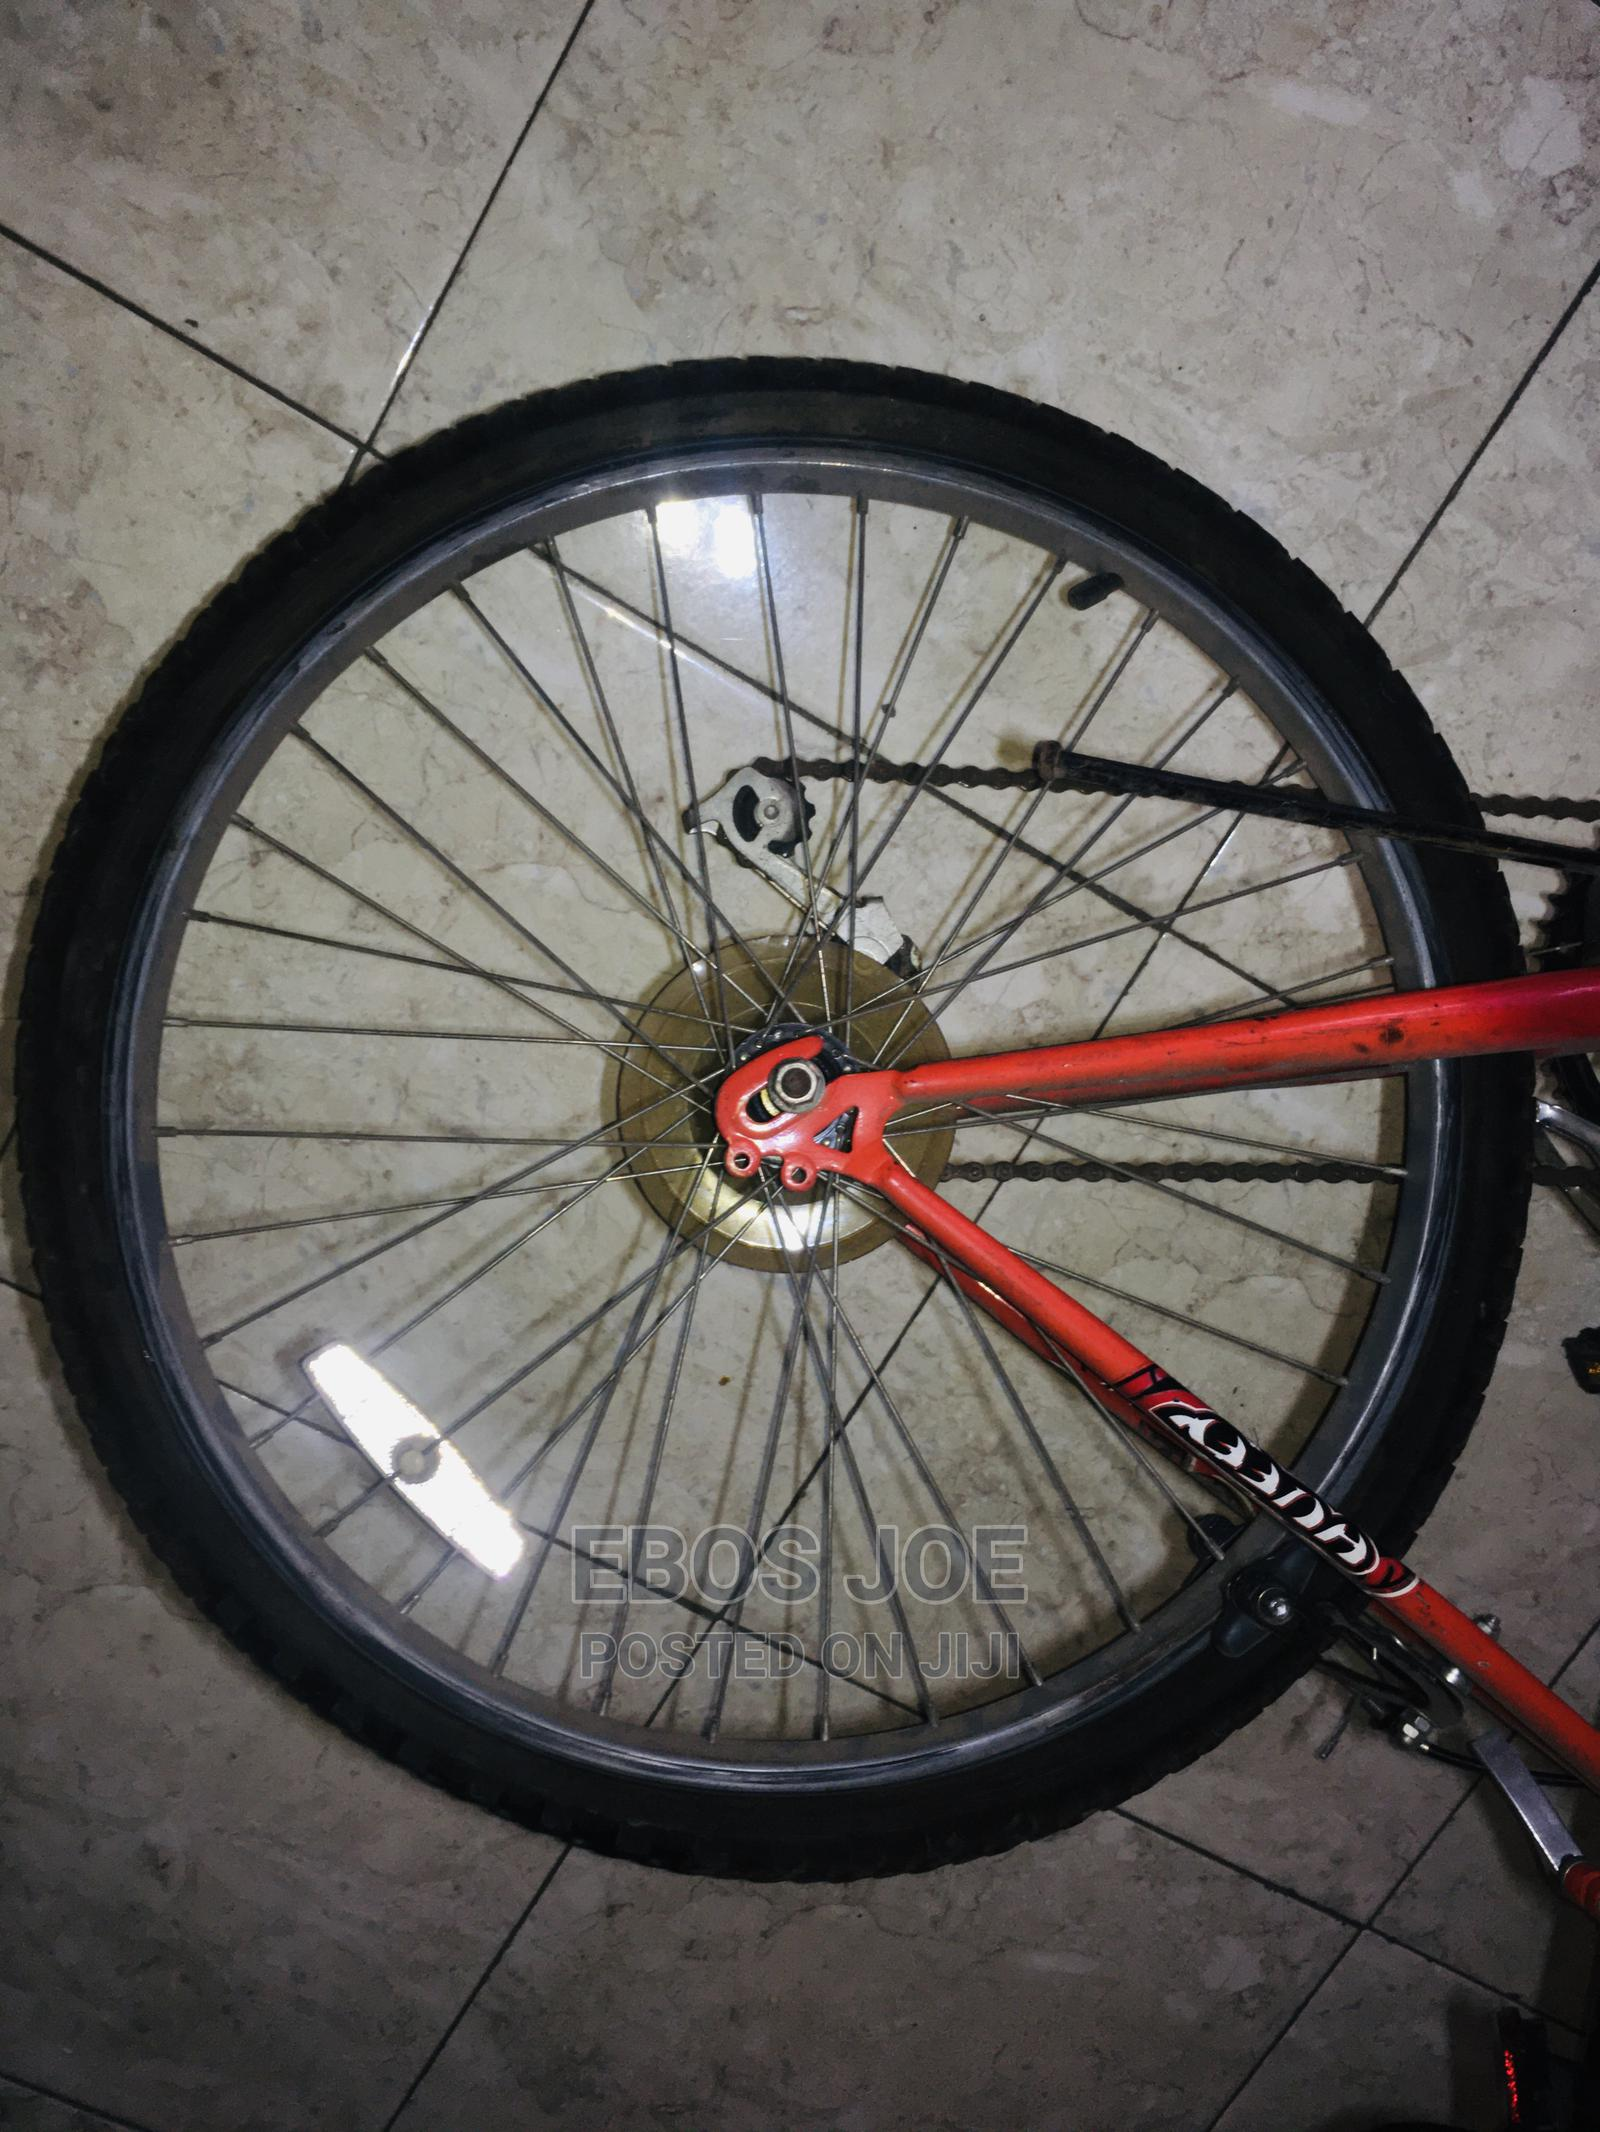 Us Used Dirt Mountain Bike Bicycle